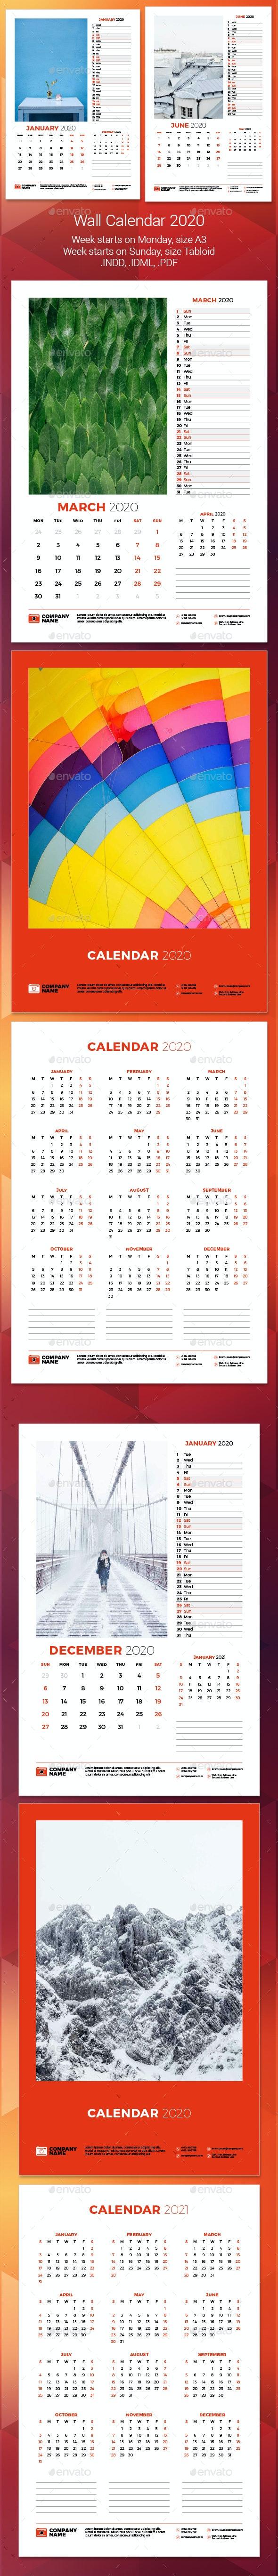 Wall Calendar 2020 - Calendars Stationery